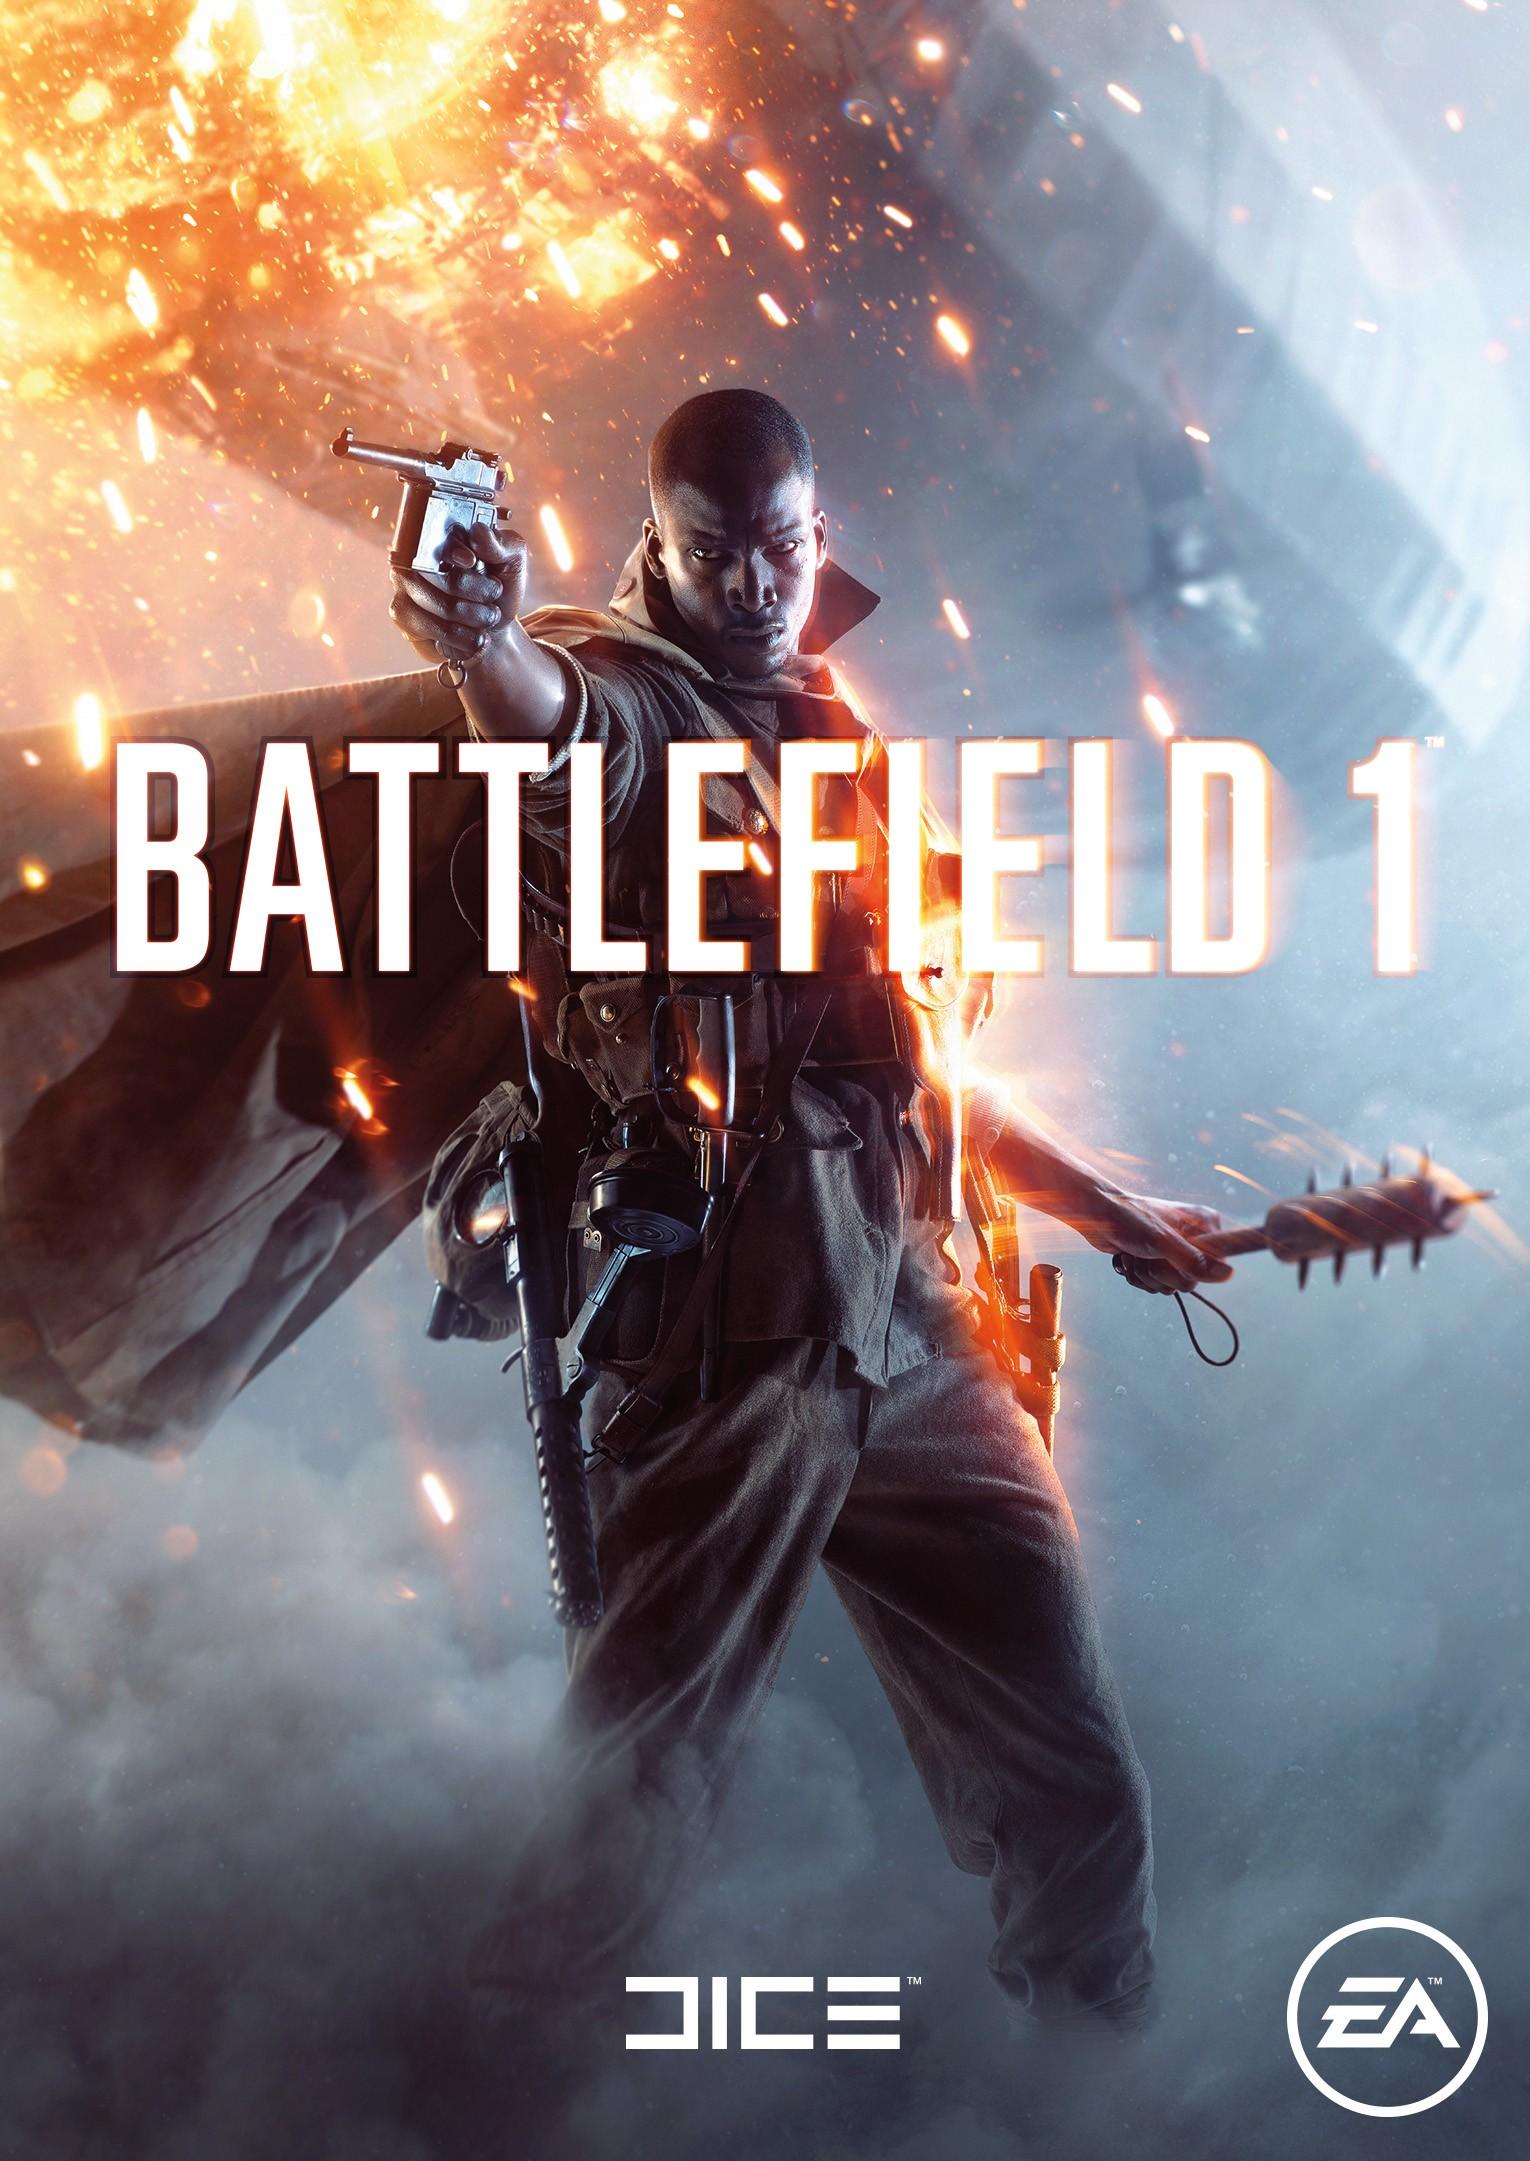 Top Wallpaper Gaming Battlefield - Battlefield_1_PC_gaming-51392  Trends_398058 .jpg!d